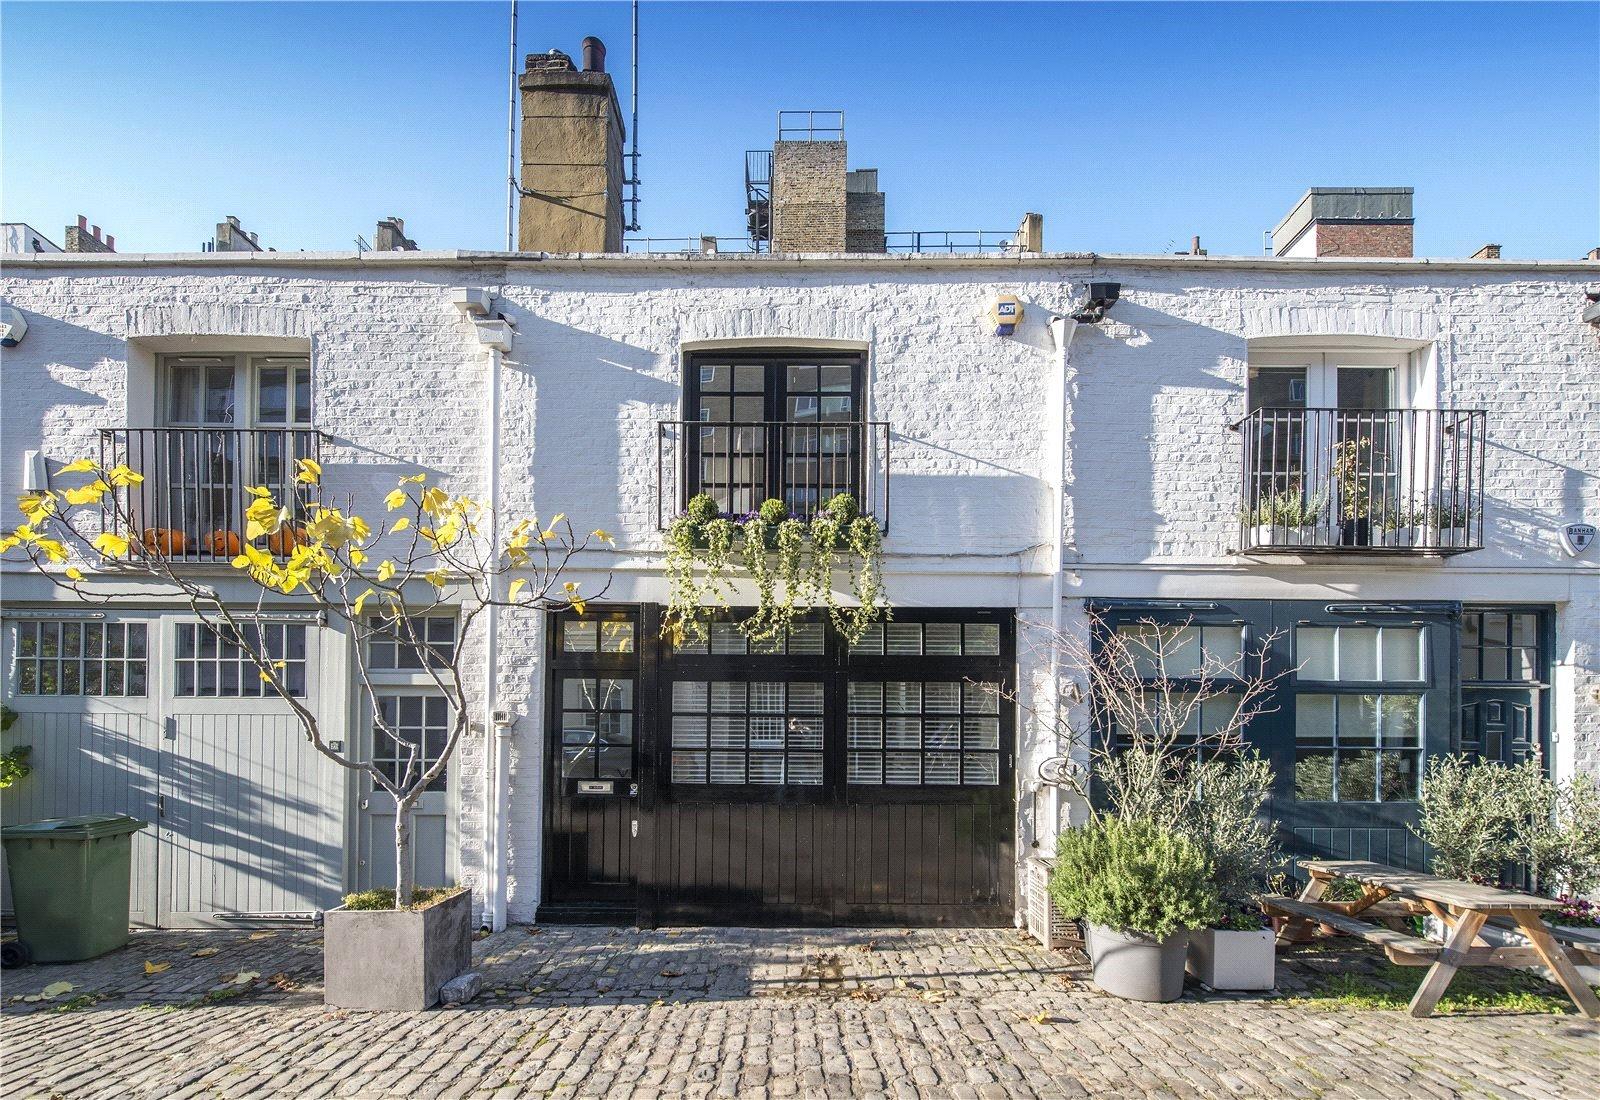 house for sale in bathurst mews paddington london w2. Black Bedroom Furniture Sets. Home Design Ideas